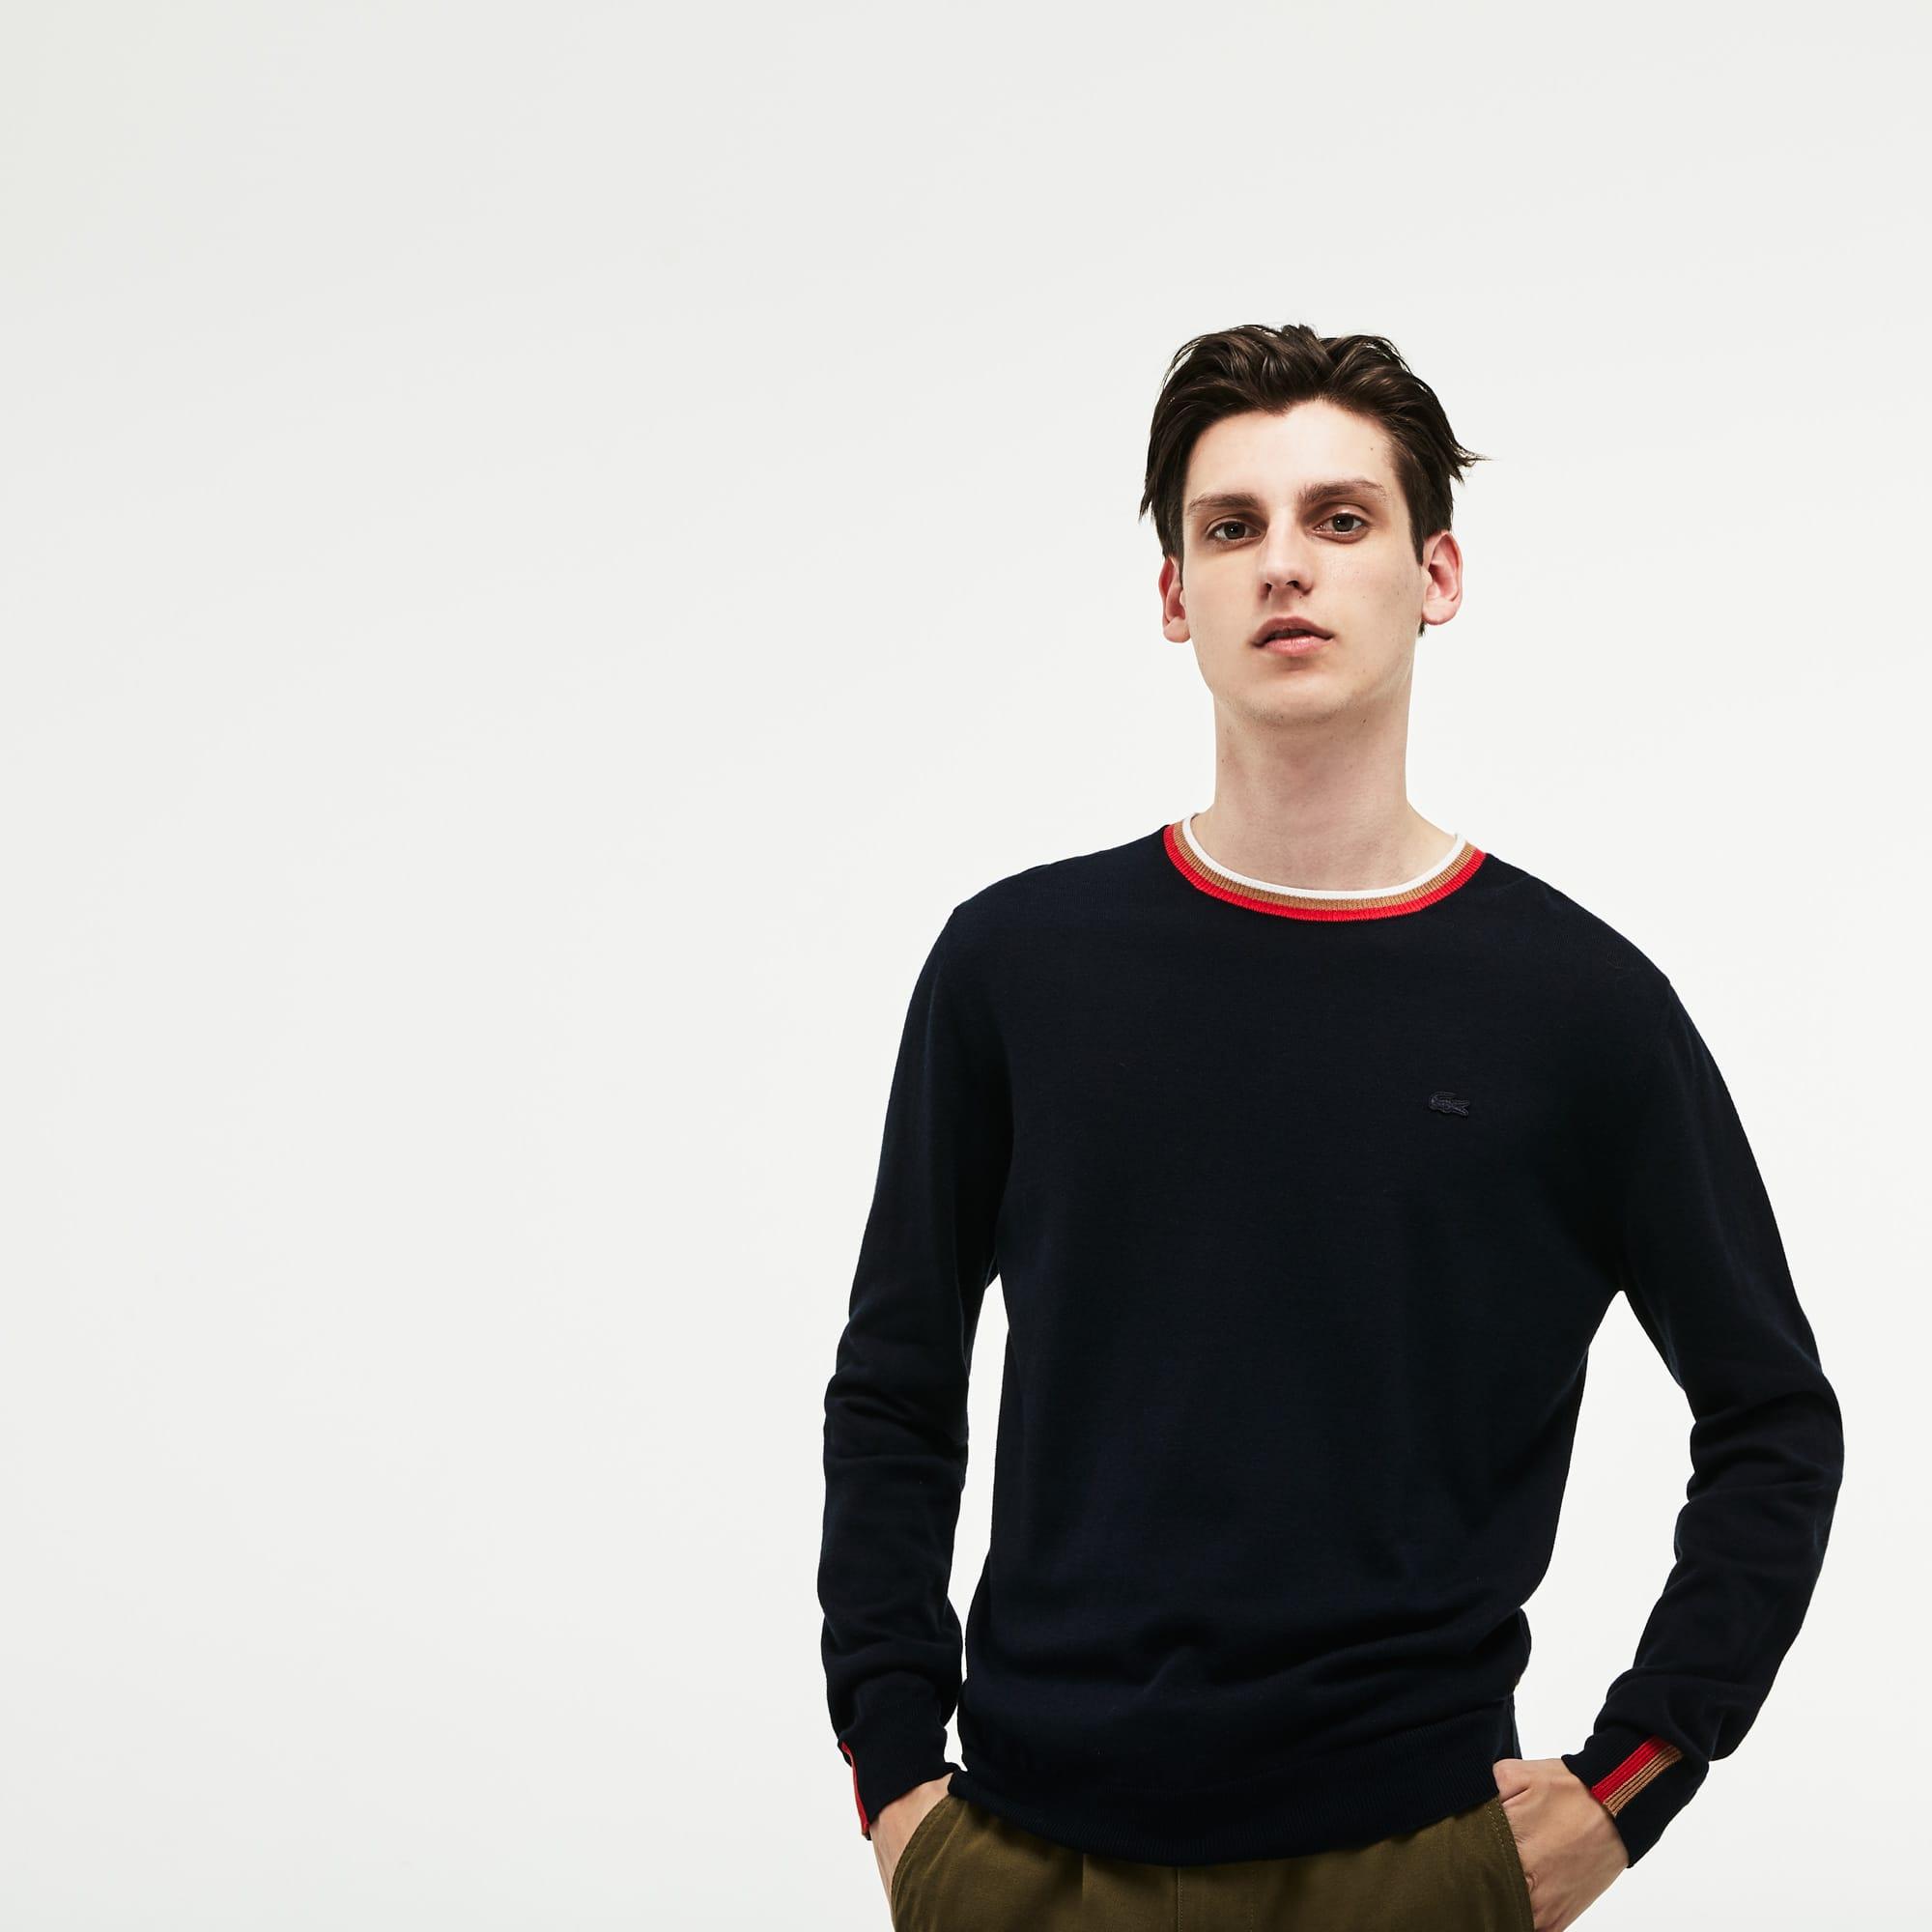 on sale ba44f d2bf6 Pullover für Herren | Herrenmode | LACOSTE